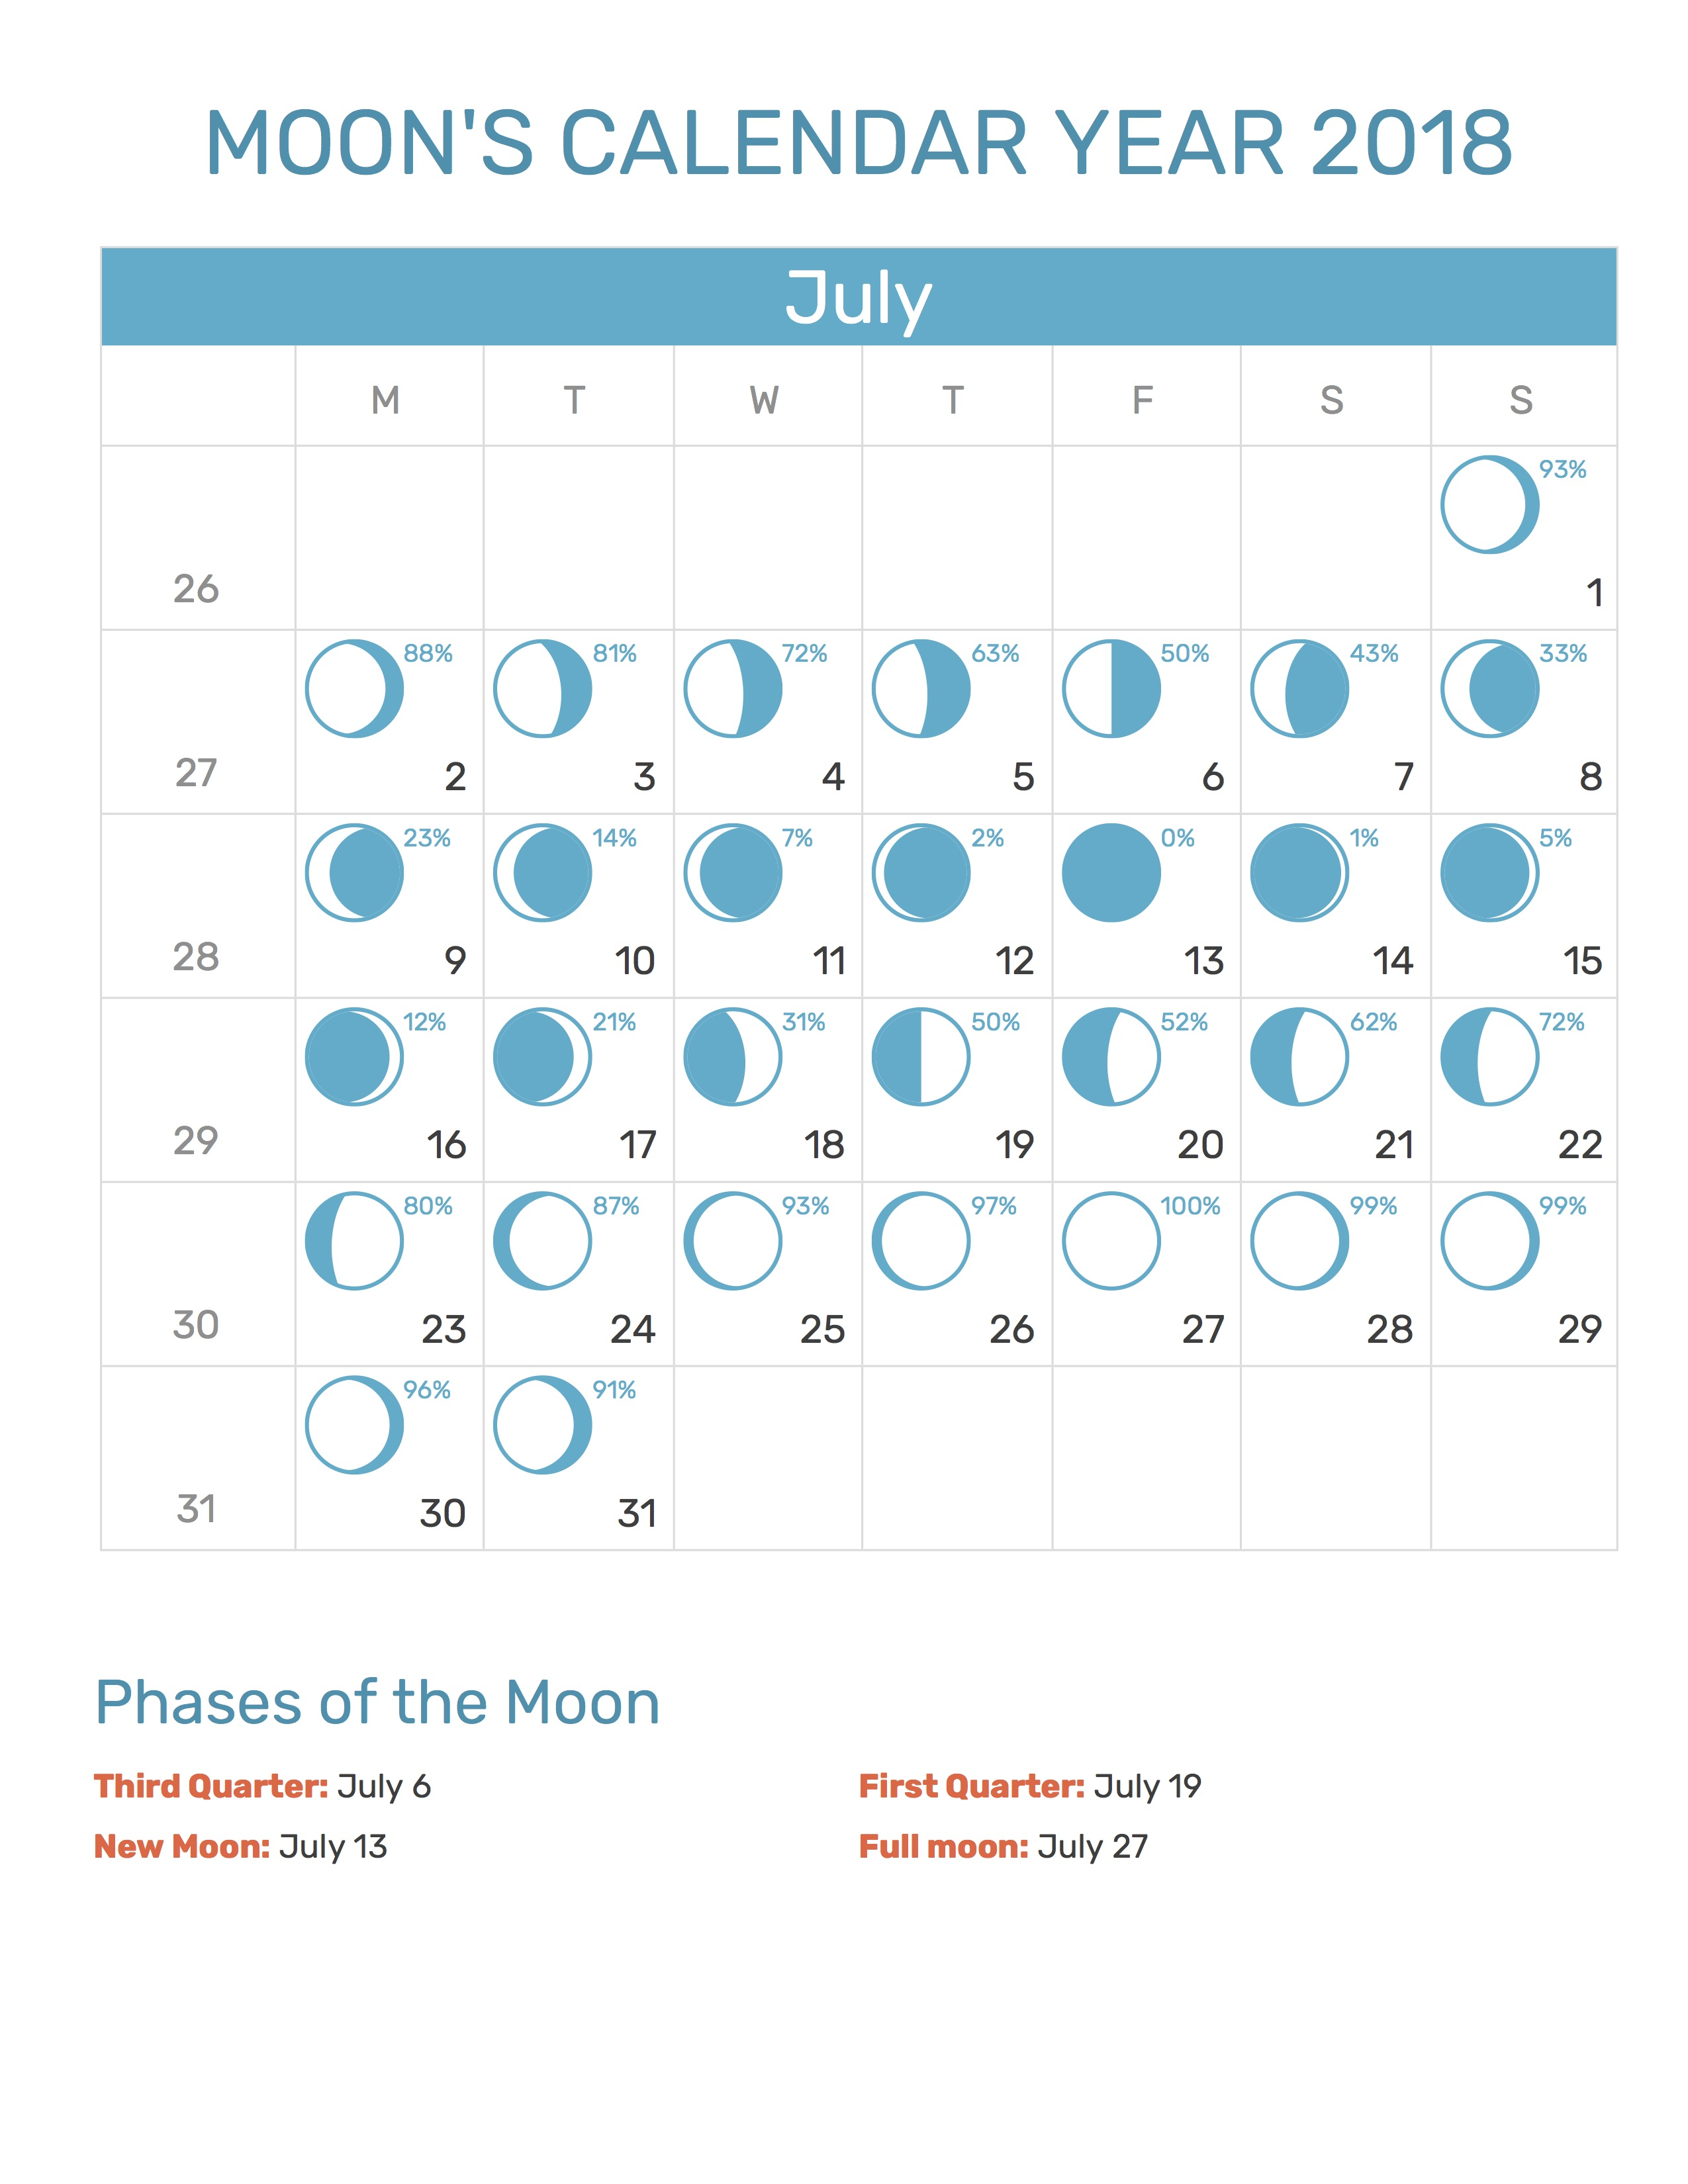 Lunar calendar for July 2018 37